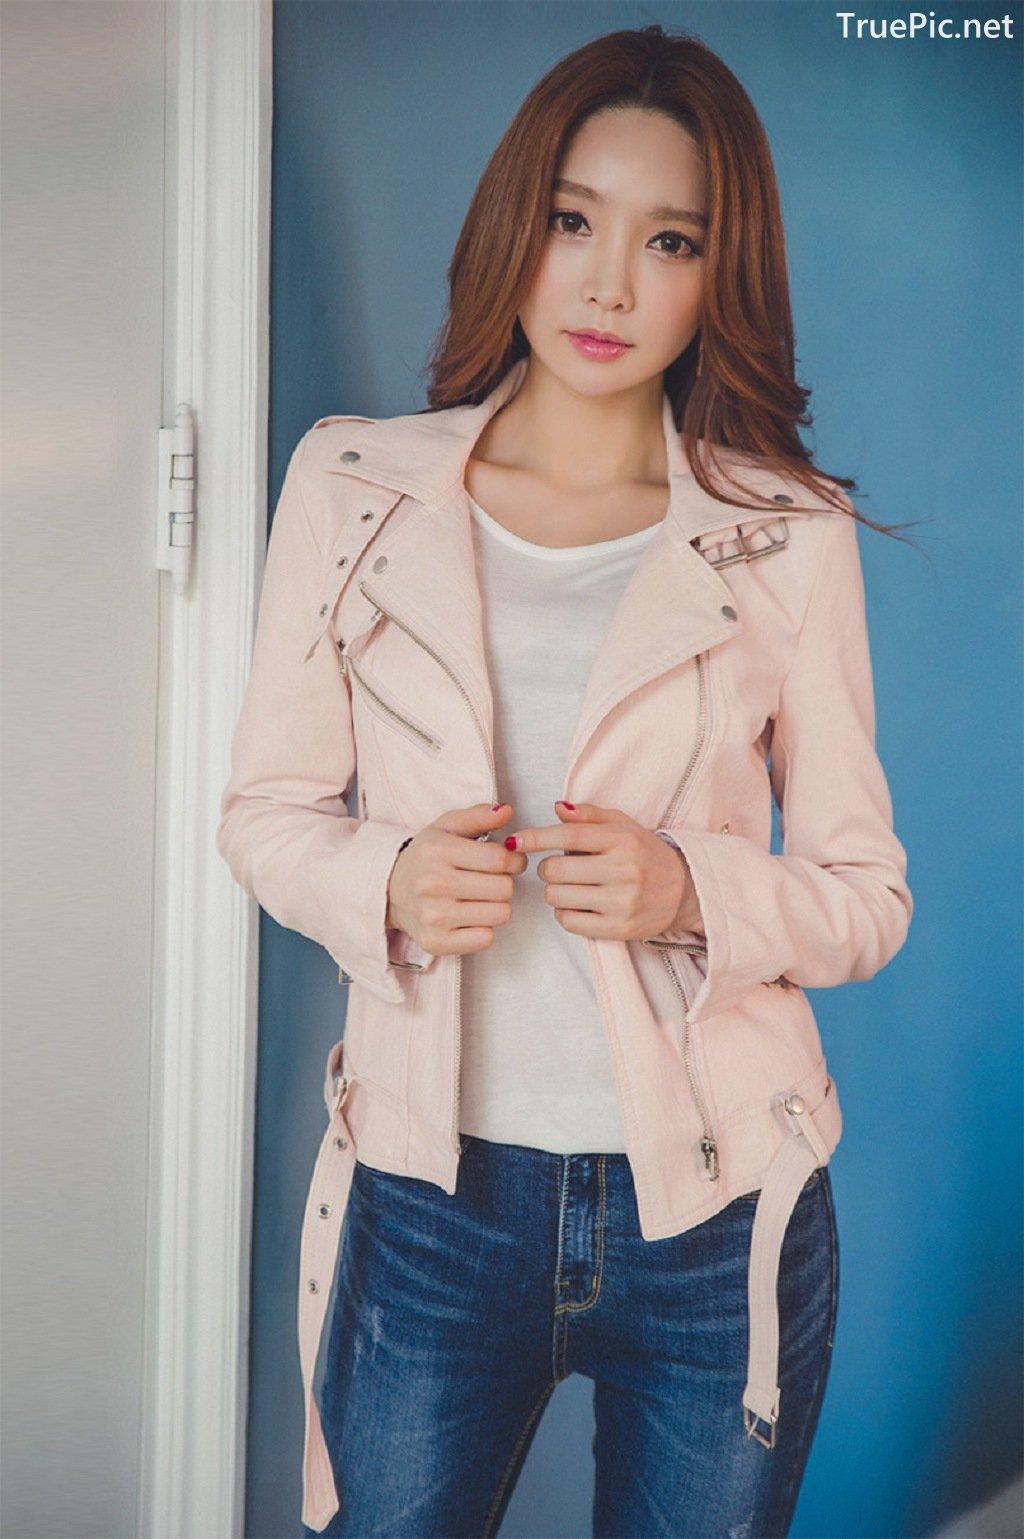 Image-Korean-Fashion-Model–Park-Soo-Yeon–Indoor-Photoshoot-Collection-TruePic.nett- Picture-5